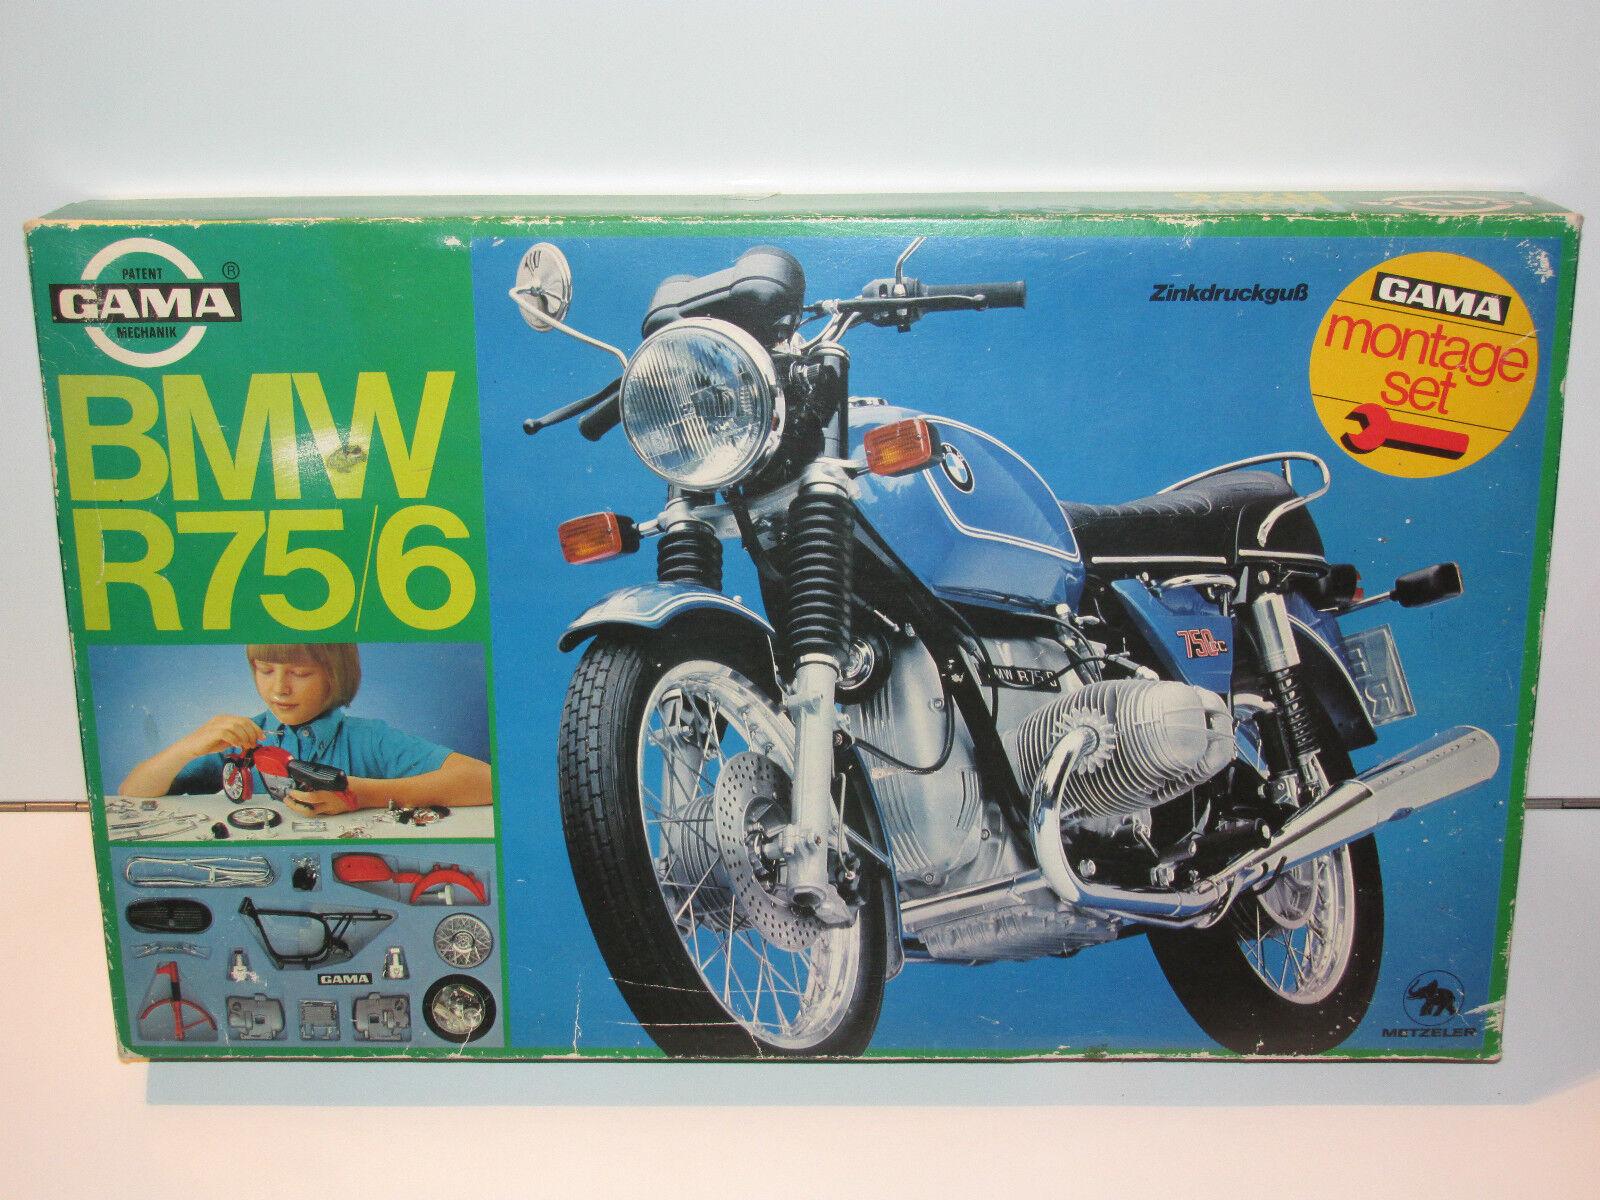 VINTAGE MODEL KIT GAMA NO 1285 BMW R75/6 MONTAGE SET MIB 1970s GERMANY RARE